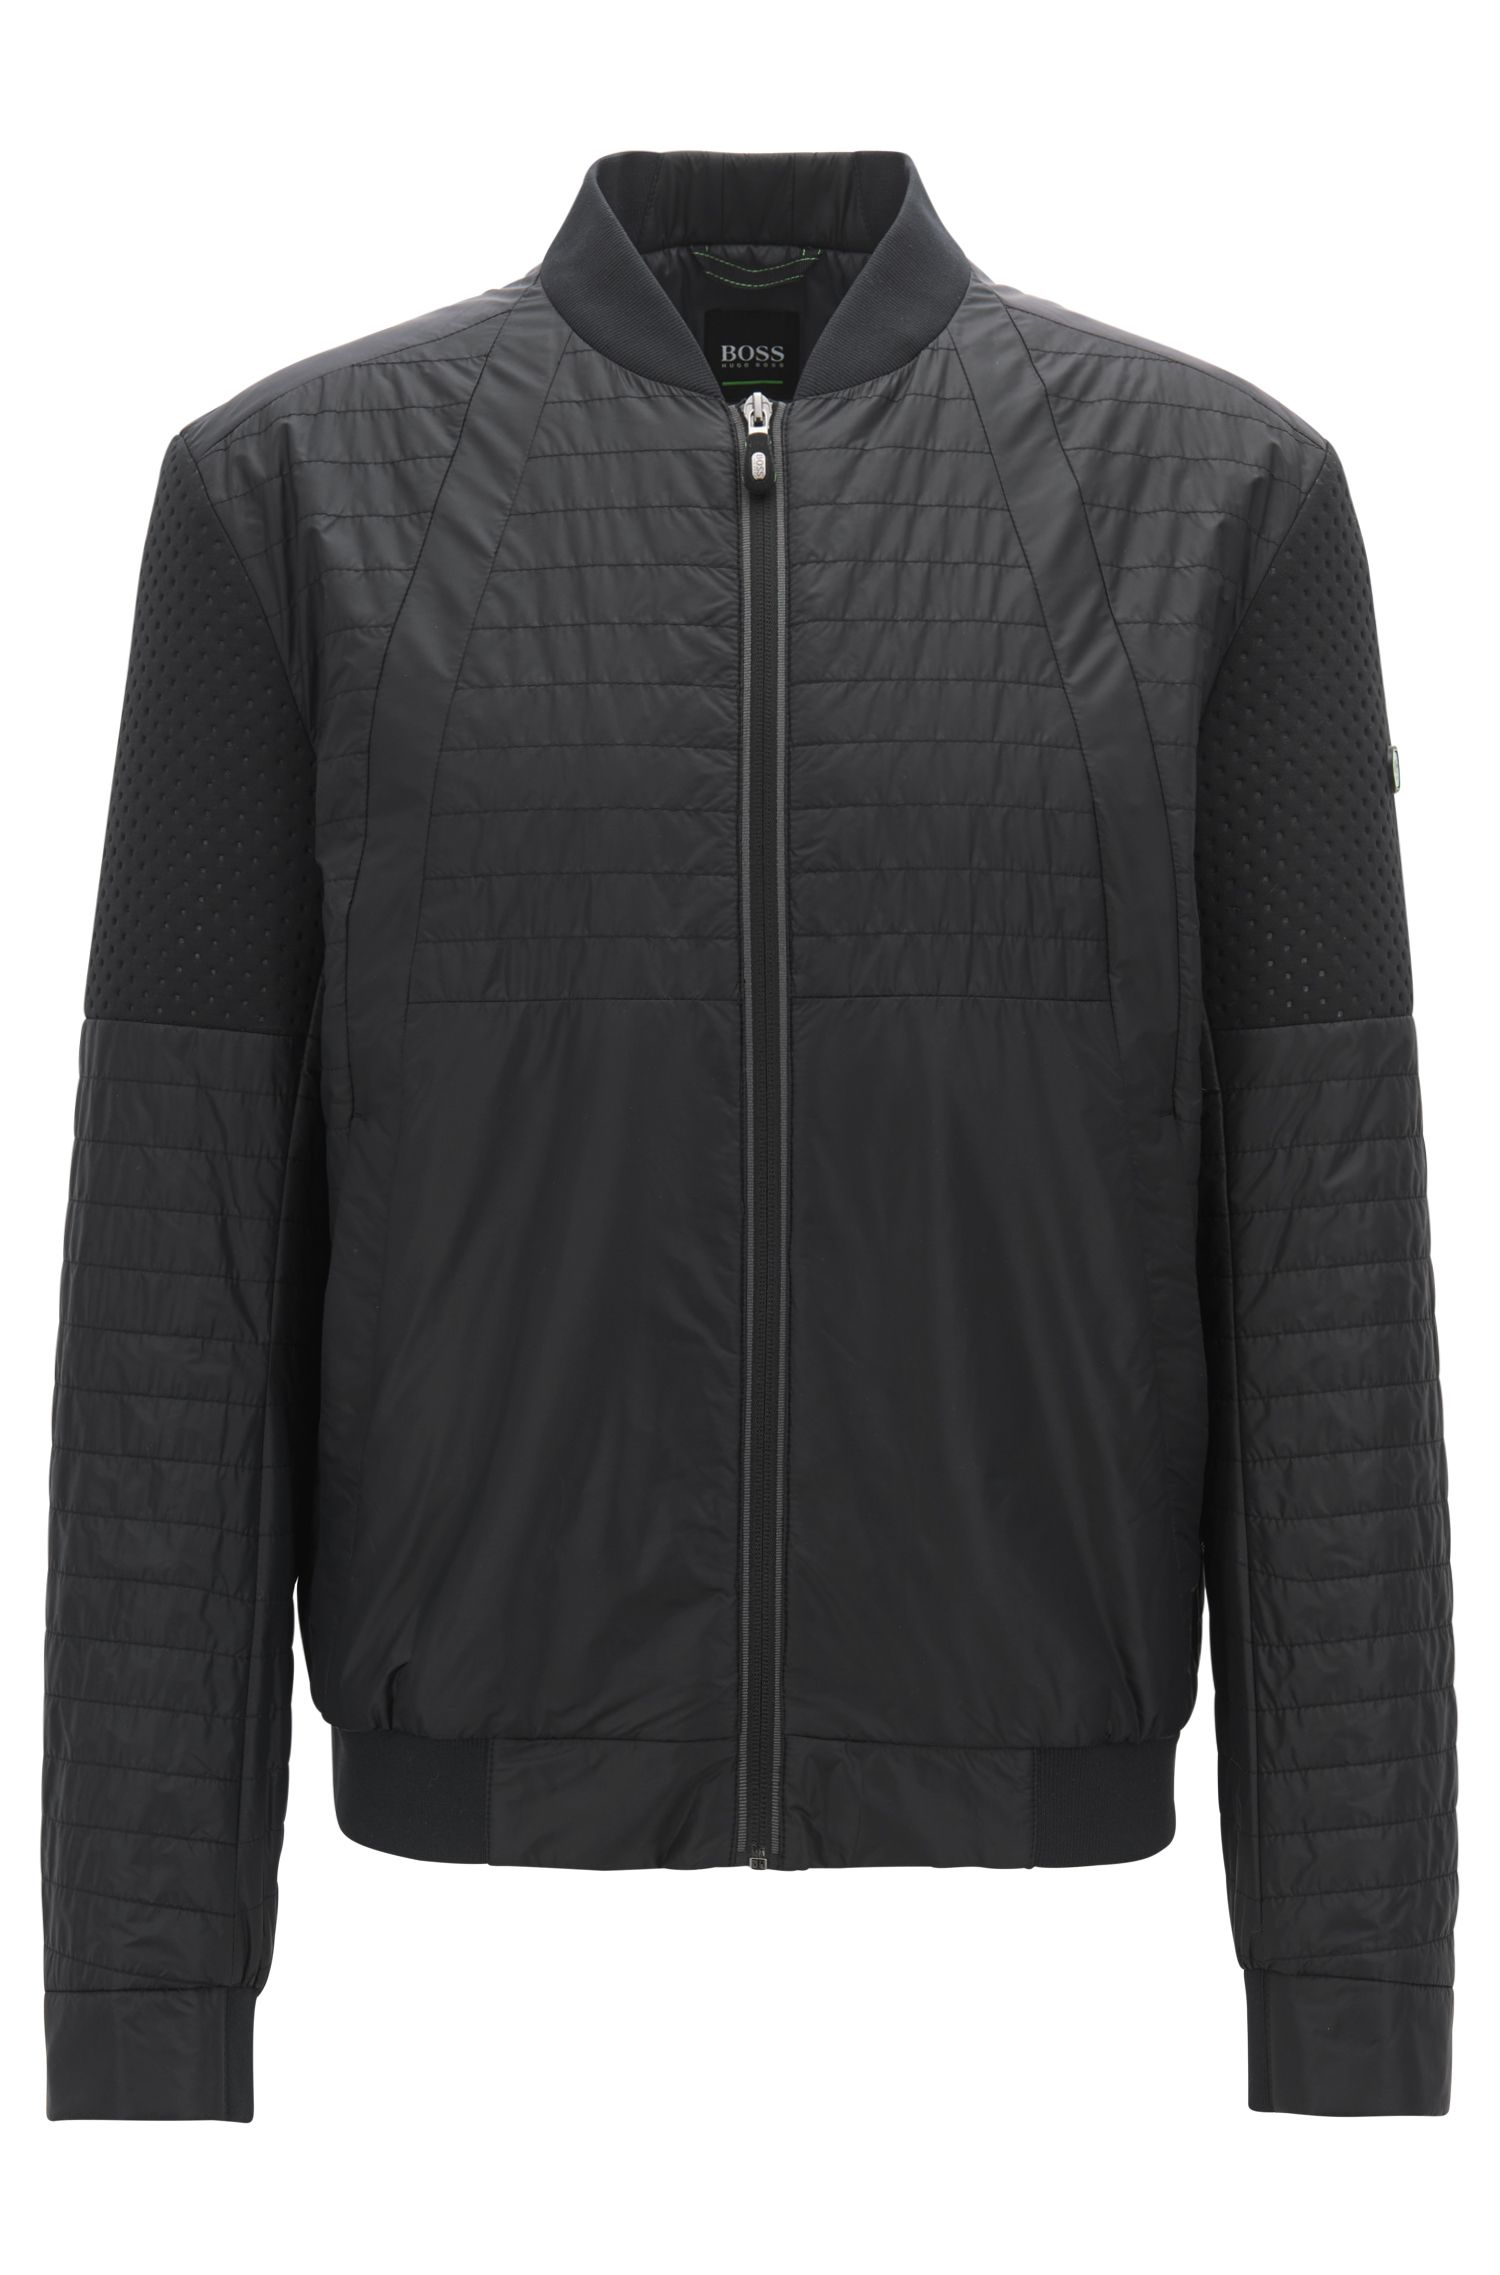 Hugo Boss - Water-repellent blouson jacket with electromagnetic-waves blocker - 1